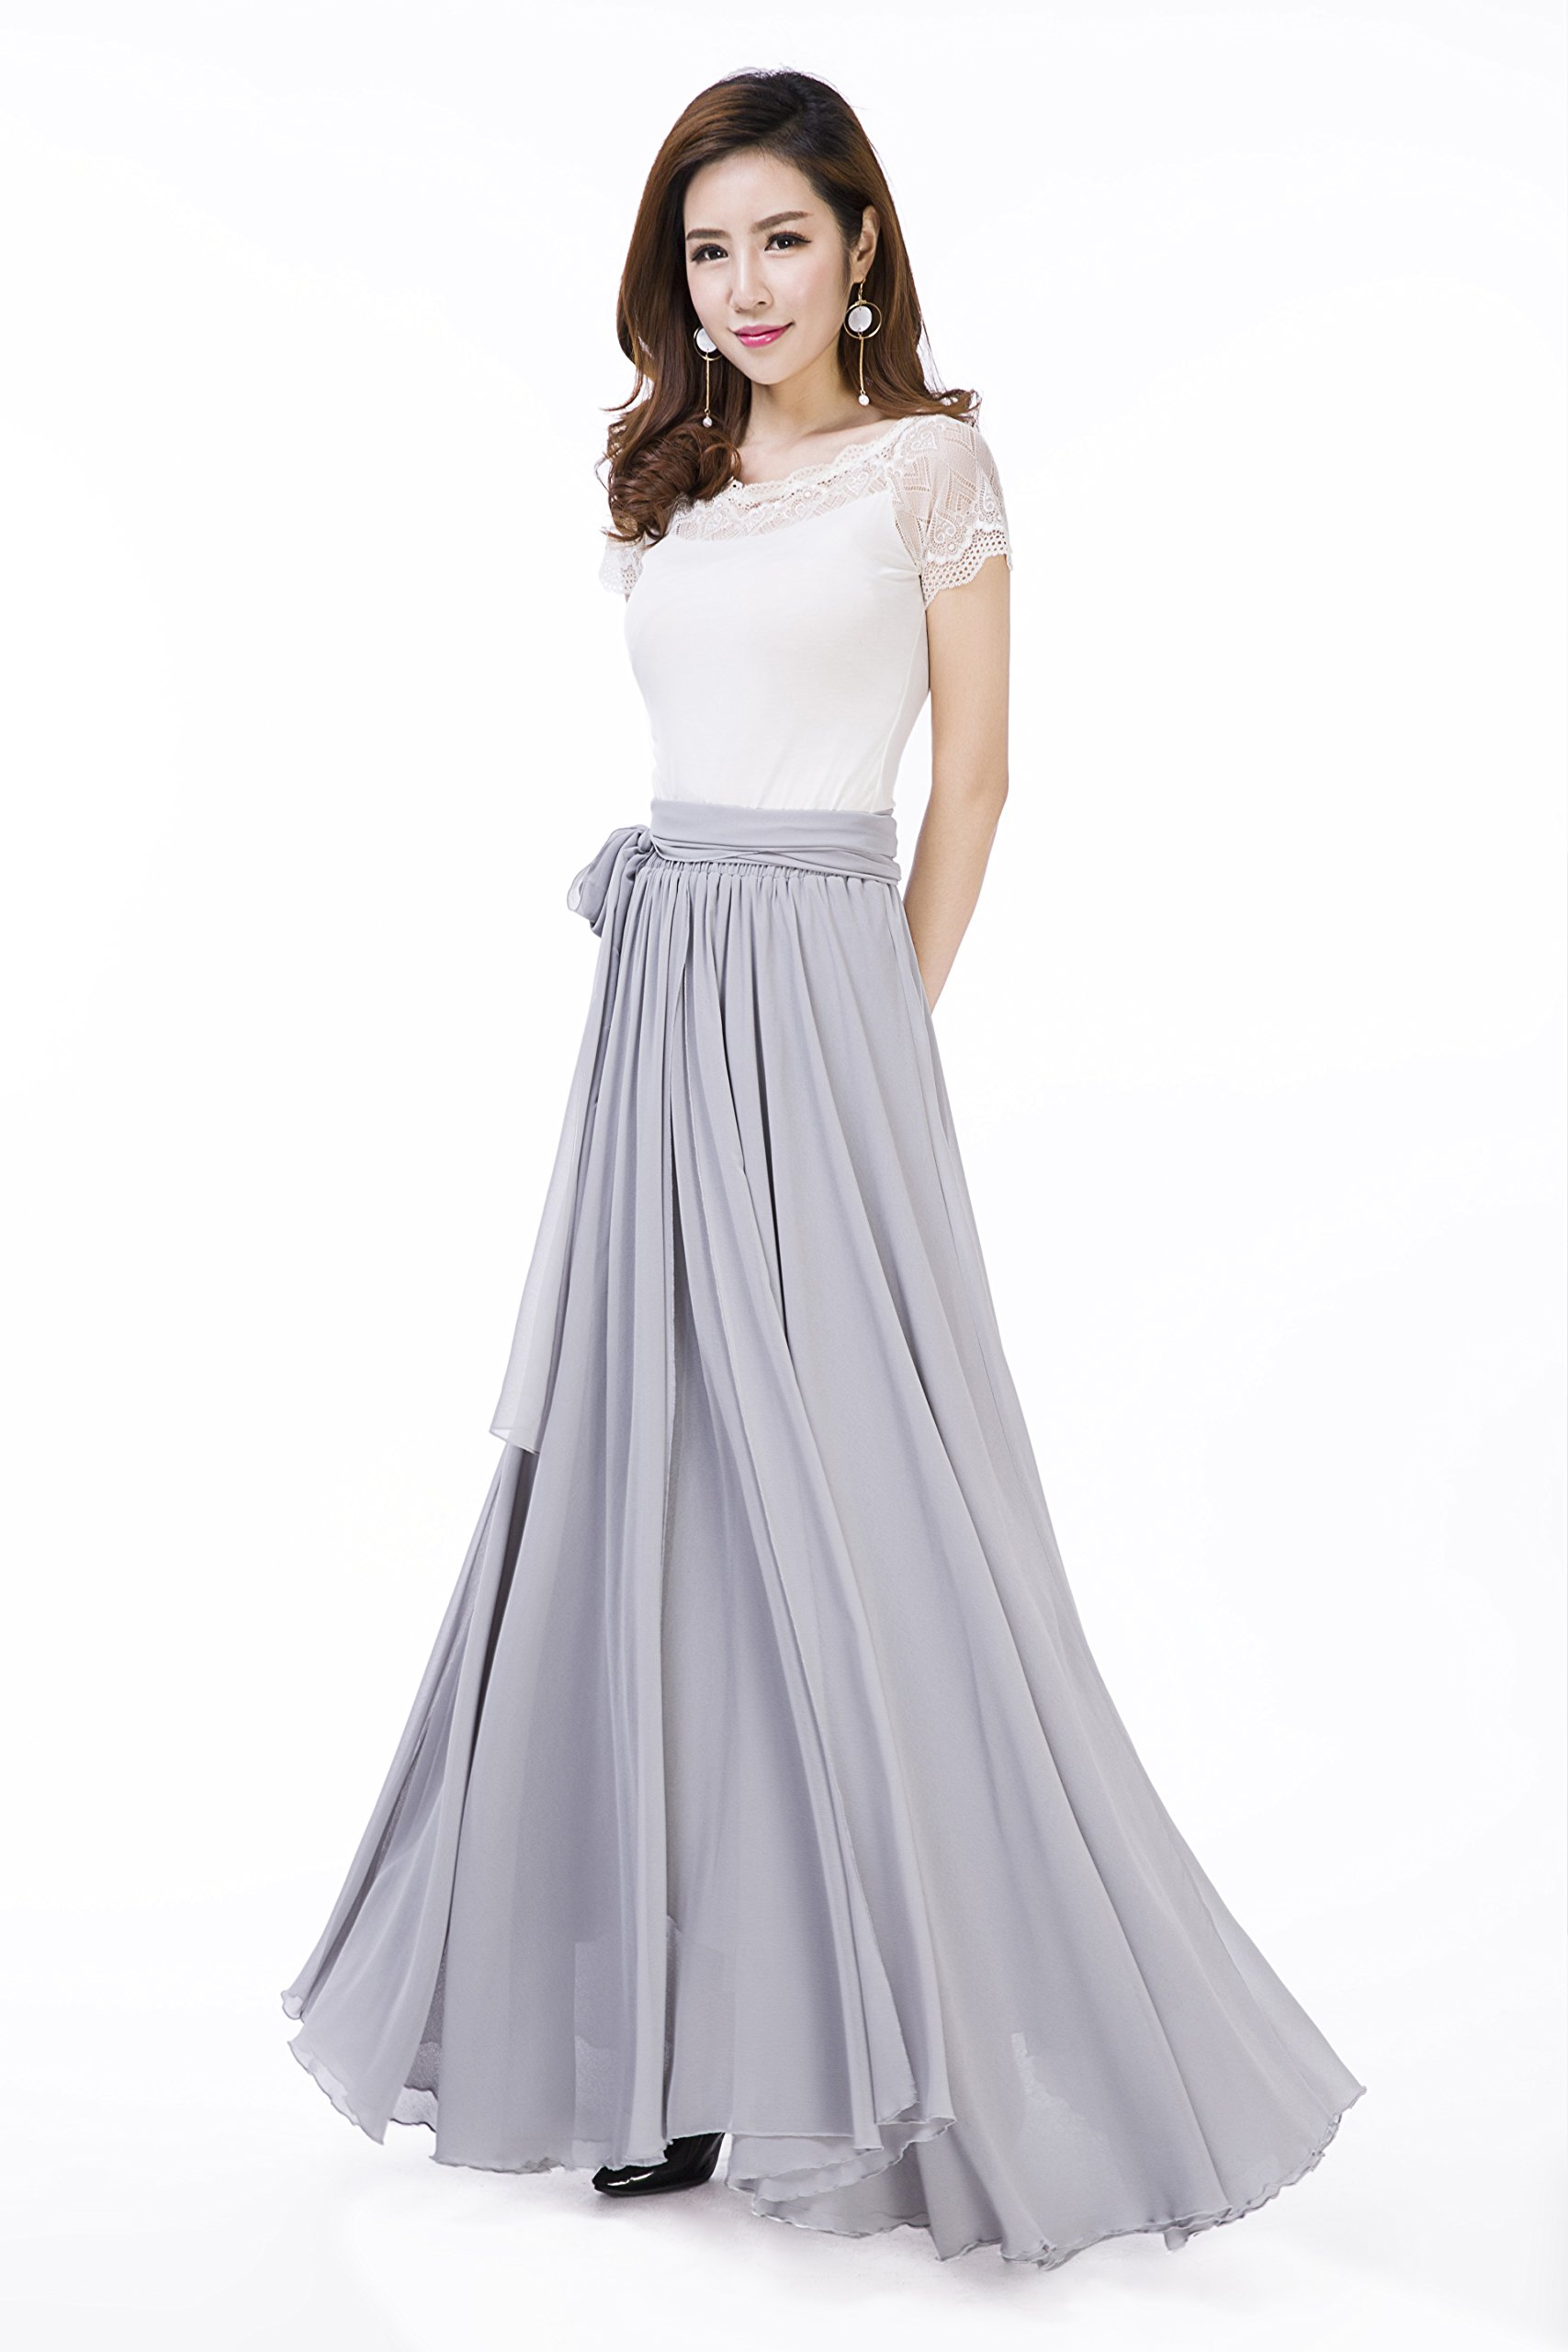 Sissily Women Summer Chiffon High Waist Pleated Big Hem Full/Ankle Length Beach Maxi Skirt(XX-Large/Light Grey)